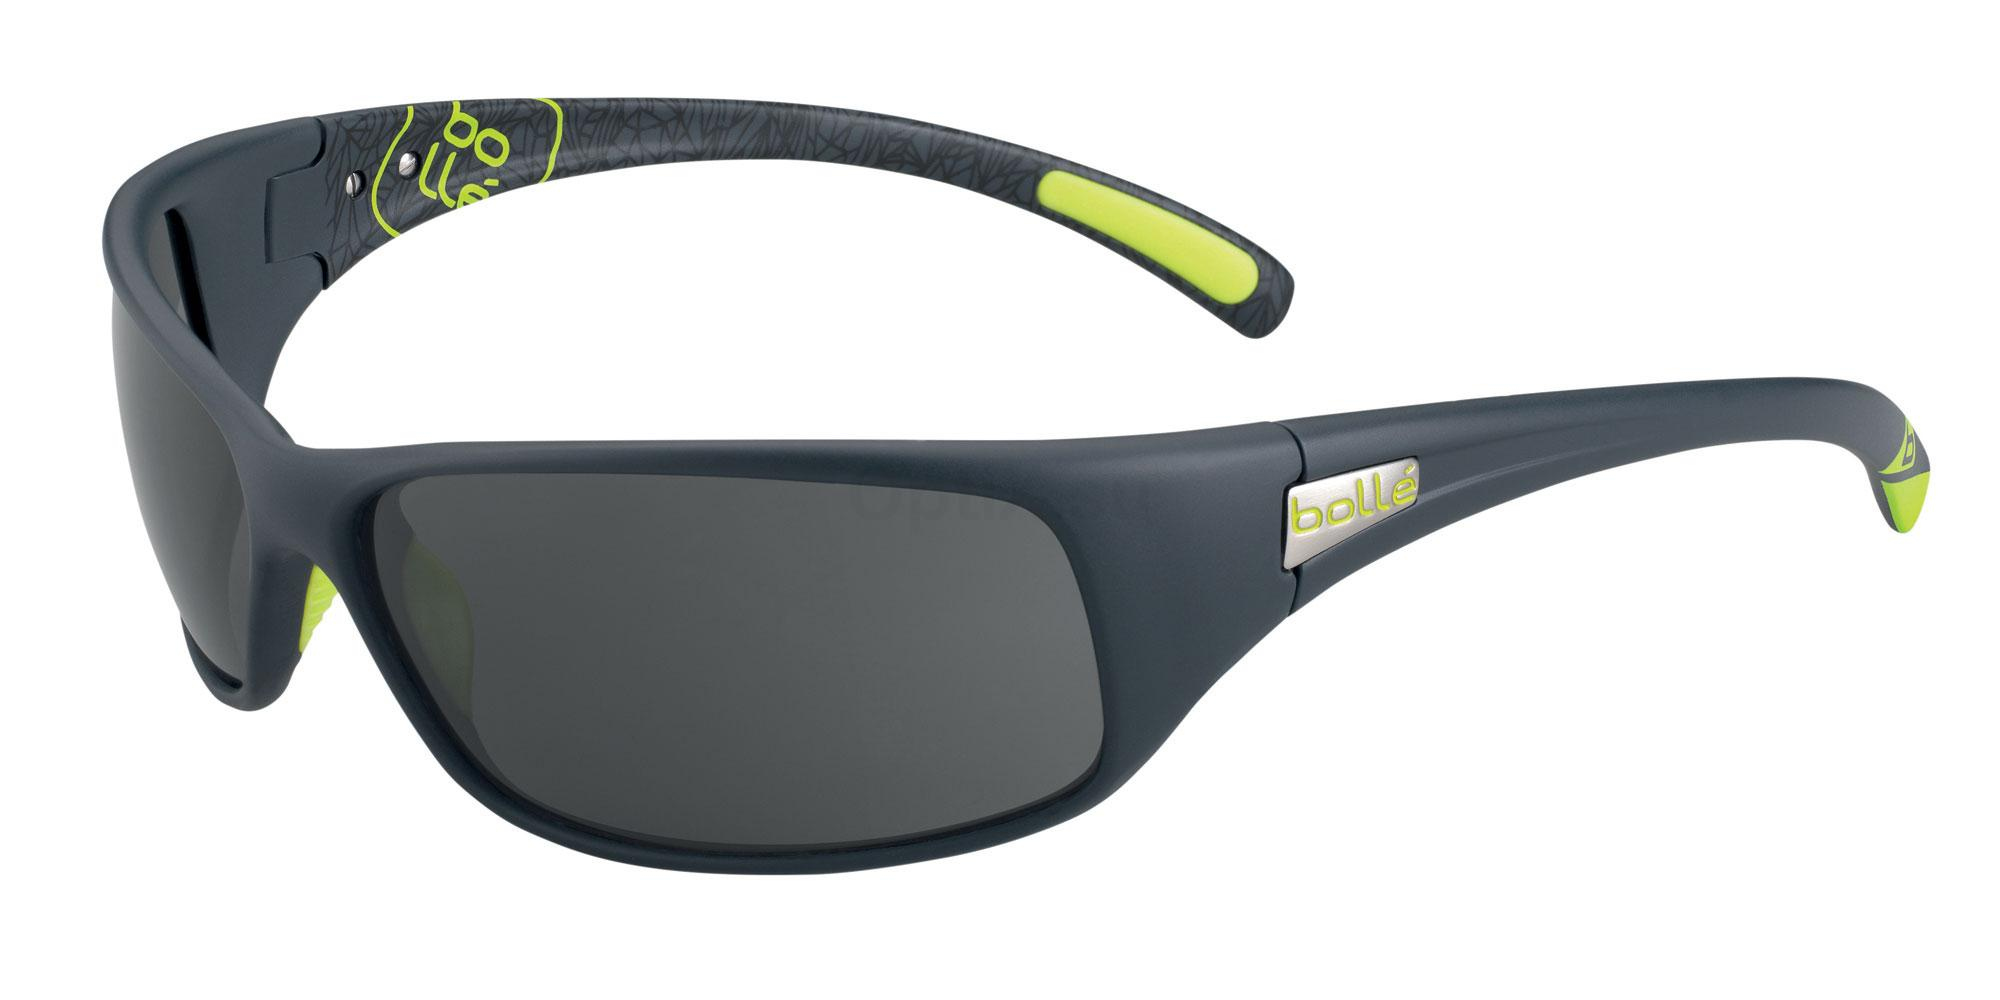 12202 Recoil Sunglasses, Bolle